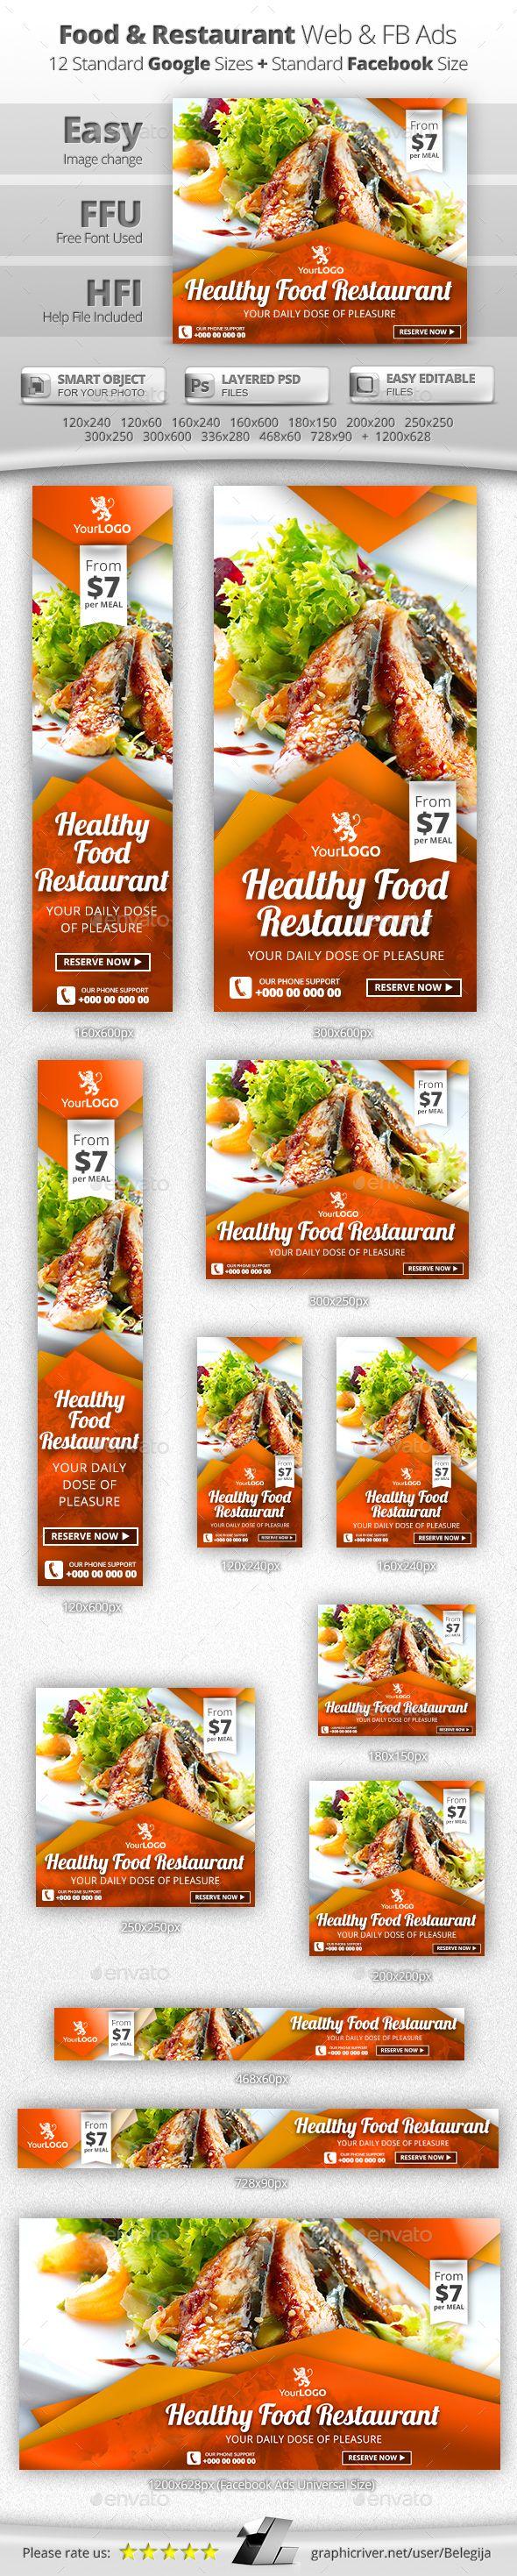 Food & Restaurant Web & Facebook Banners Template #design #ads Download: http://graphicriver.net/item/food-restaurant-web-facebook-banners/13097986?ref=ksioks